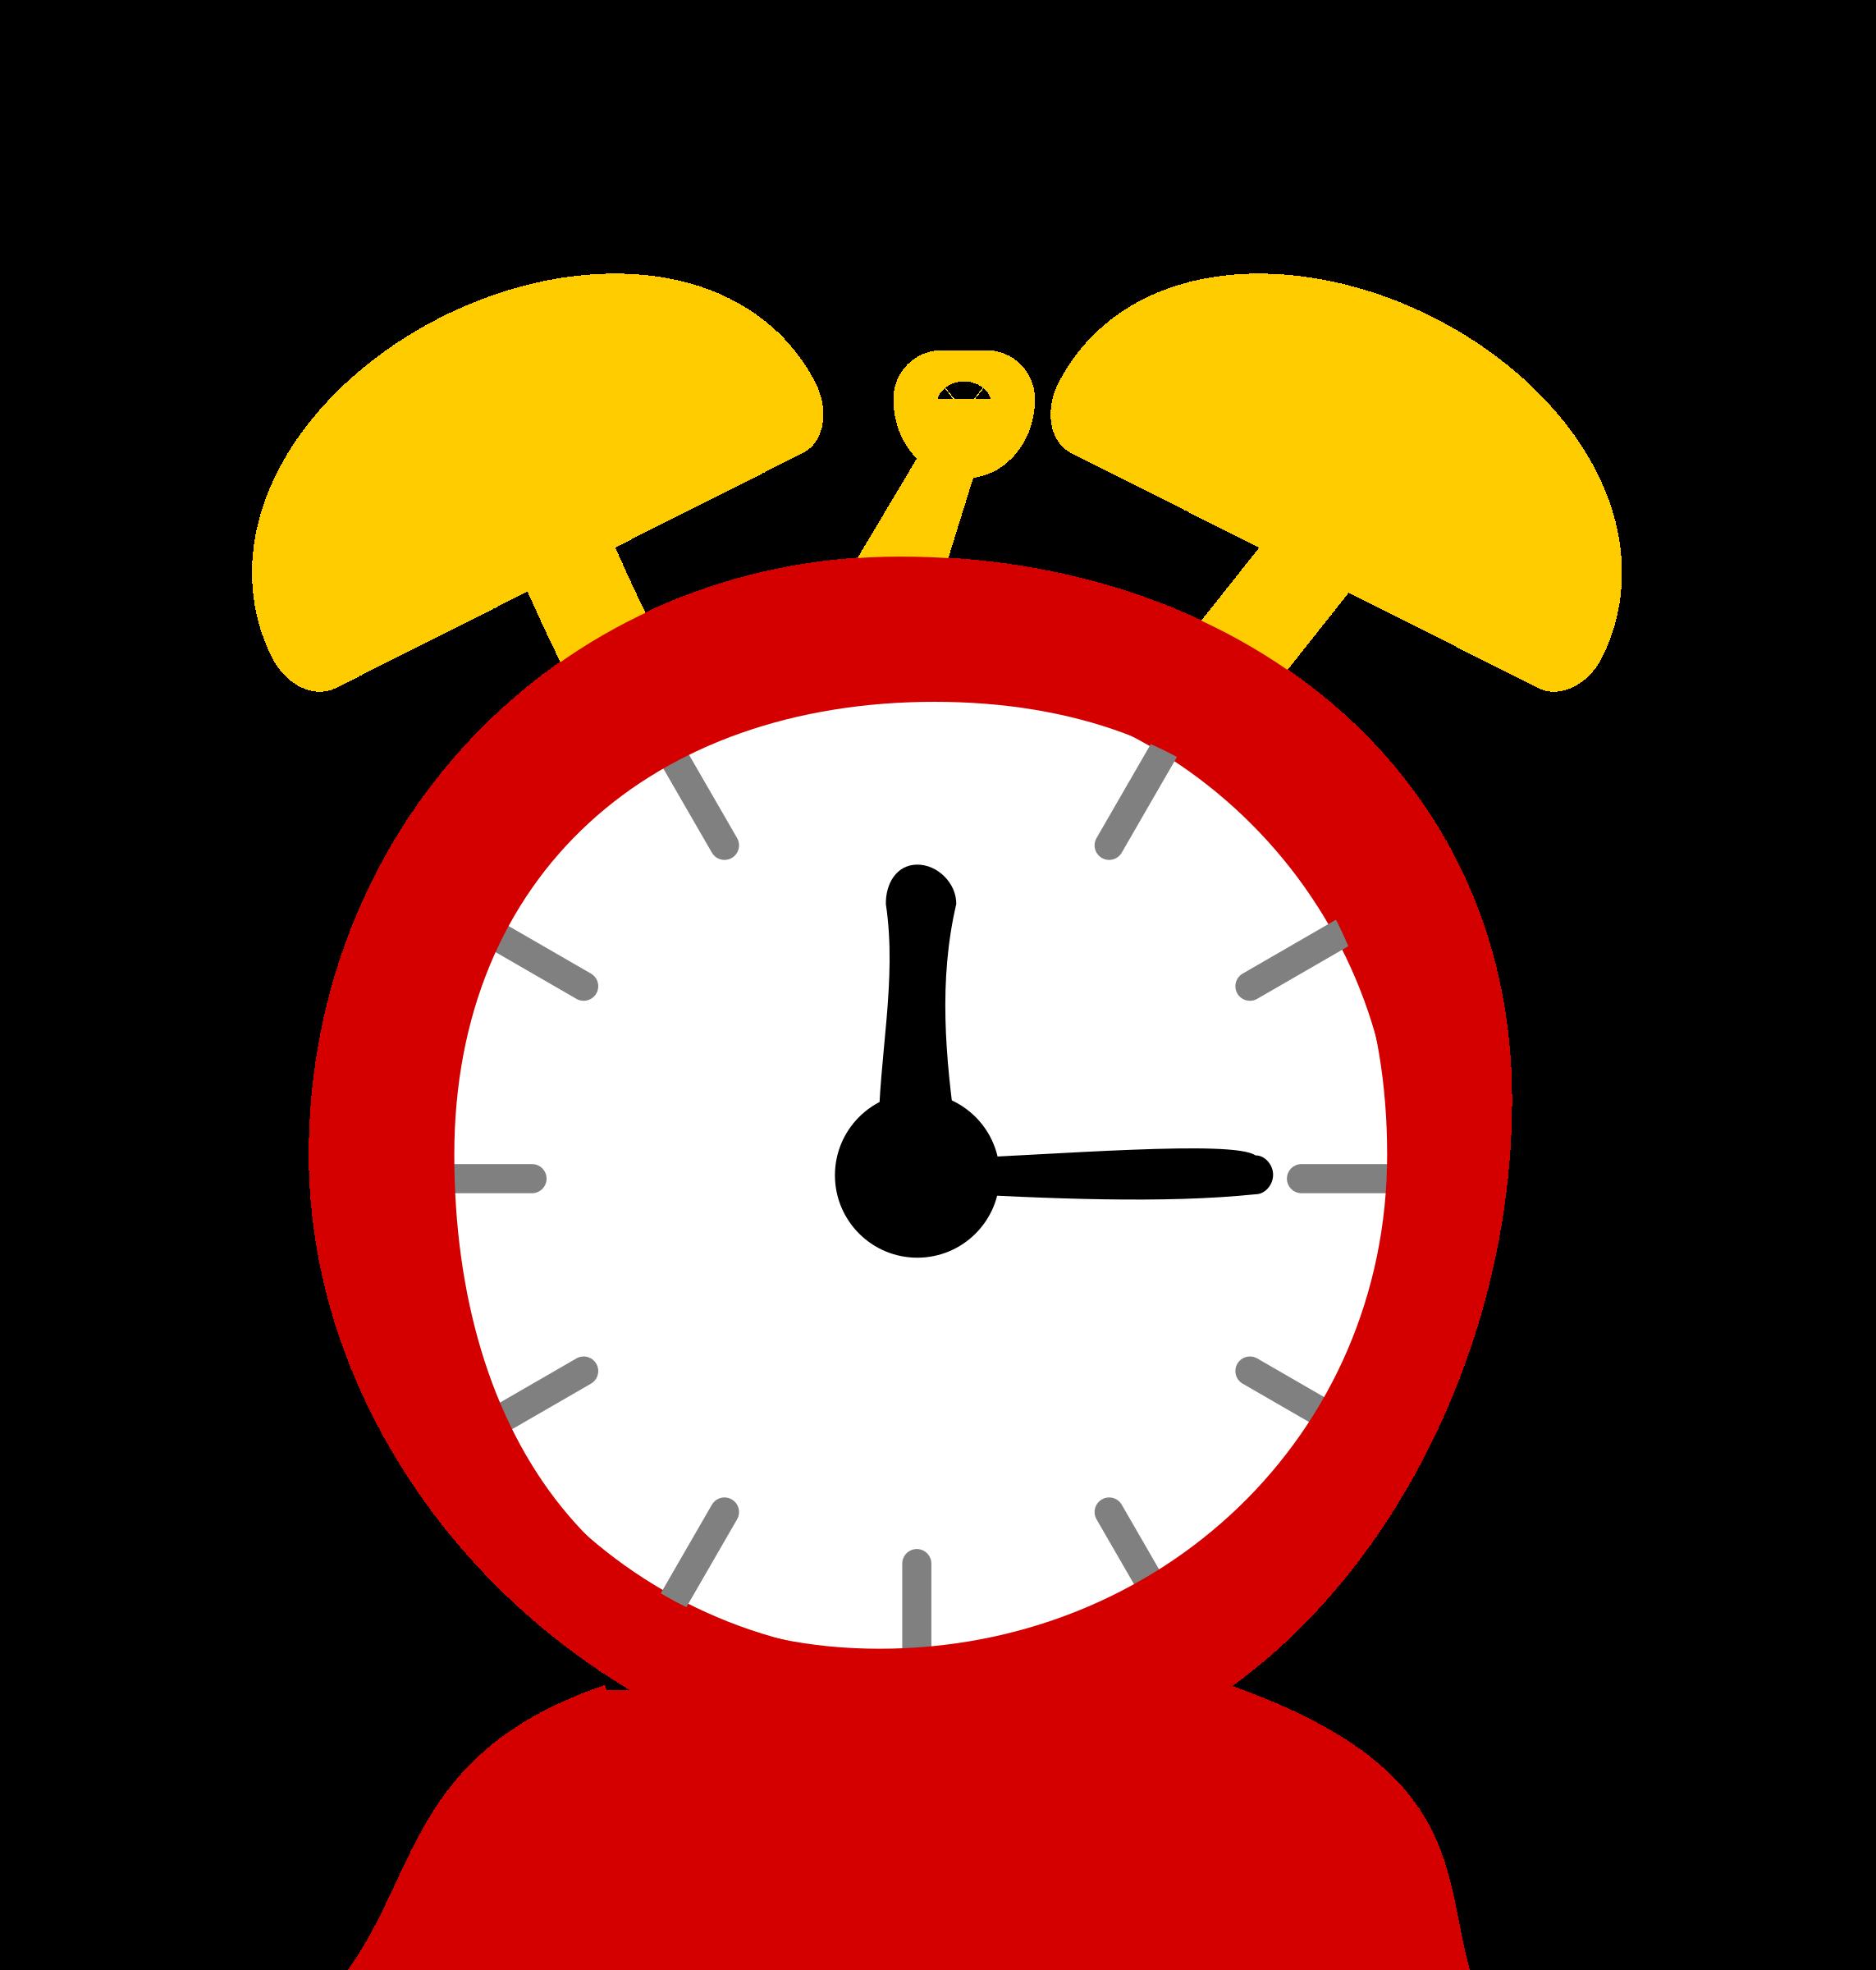 Alarm Clock By Krzysiu-Alarm Clock By Krzysiu-3